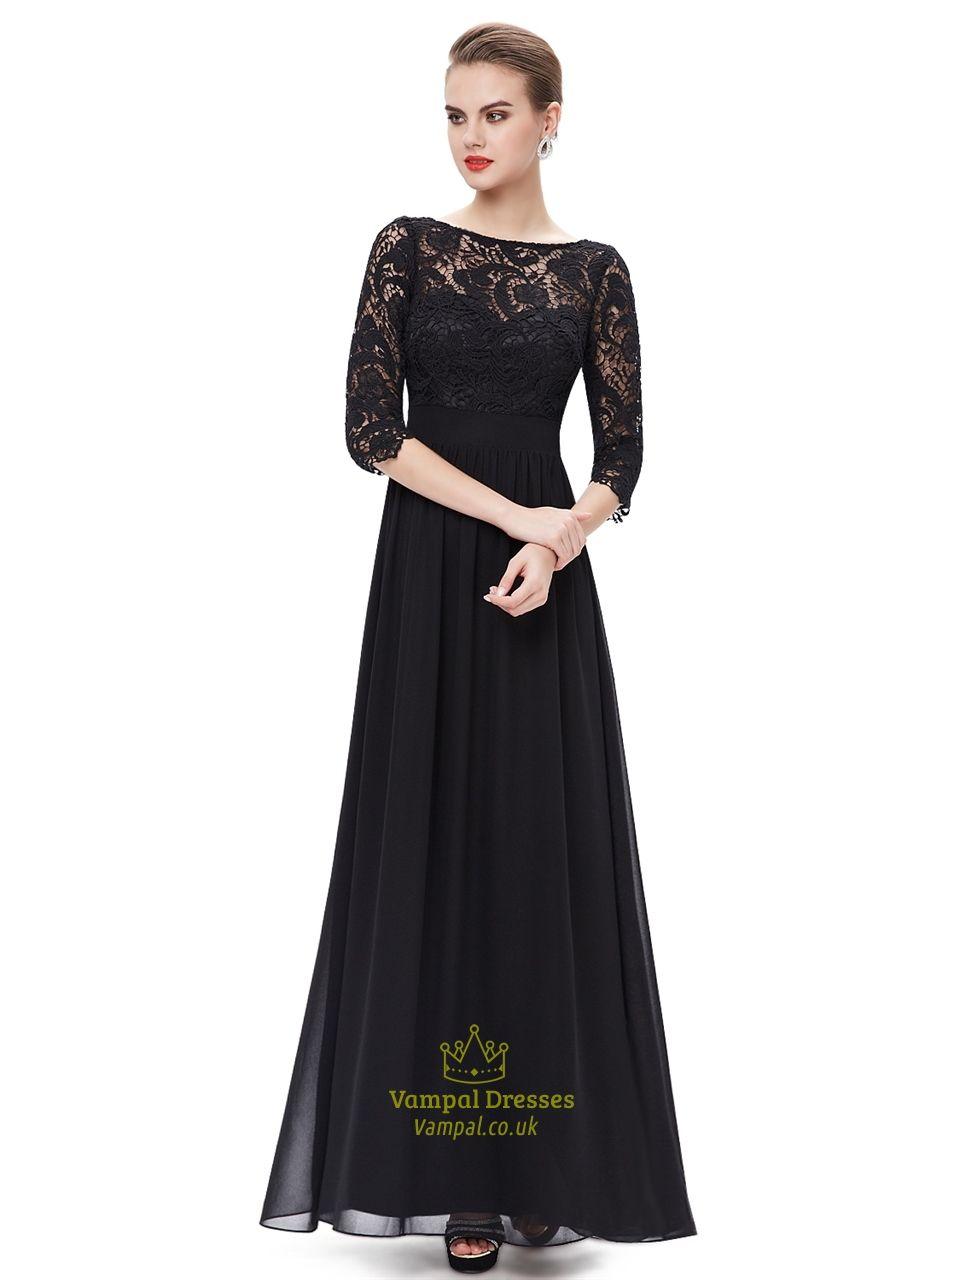 Elegant Black Lace Bodice Chiffon Prom Dress With 3/4 Length Sleeves ...